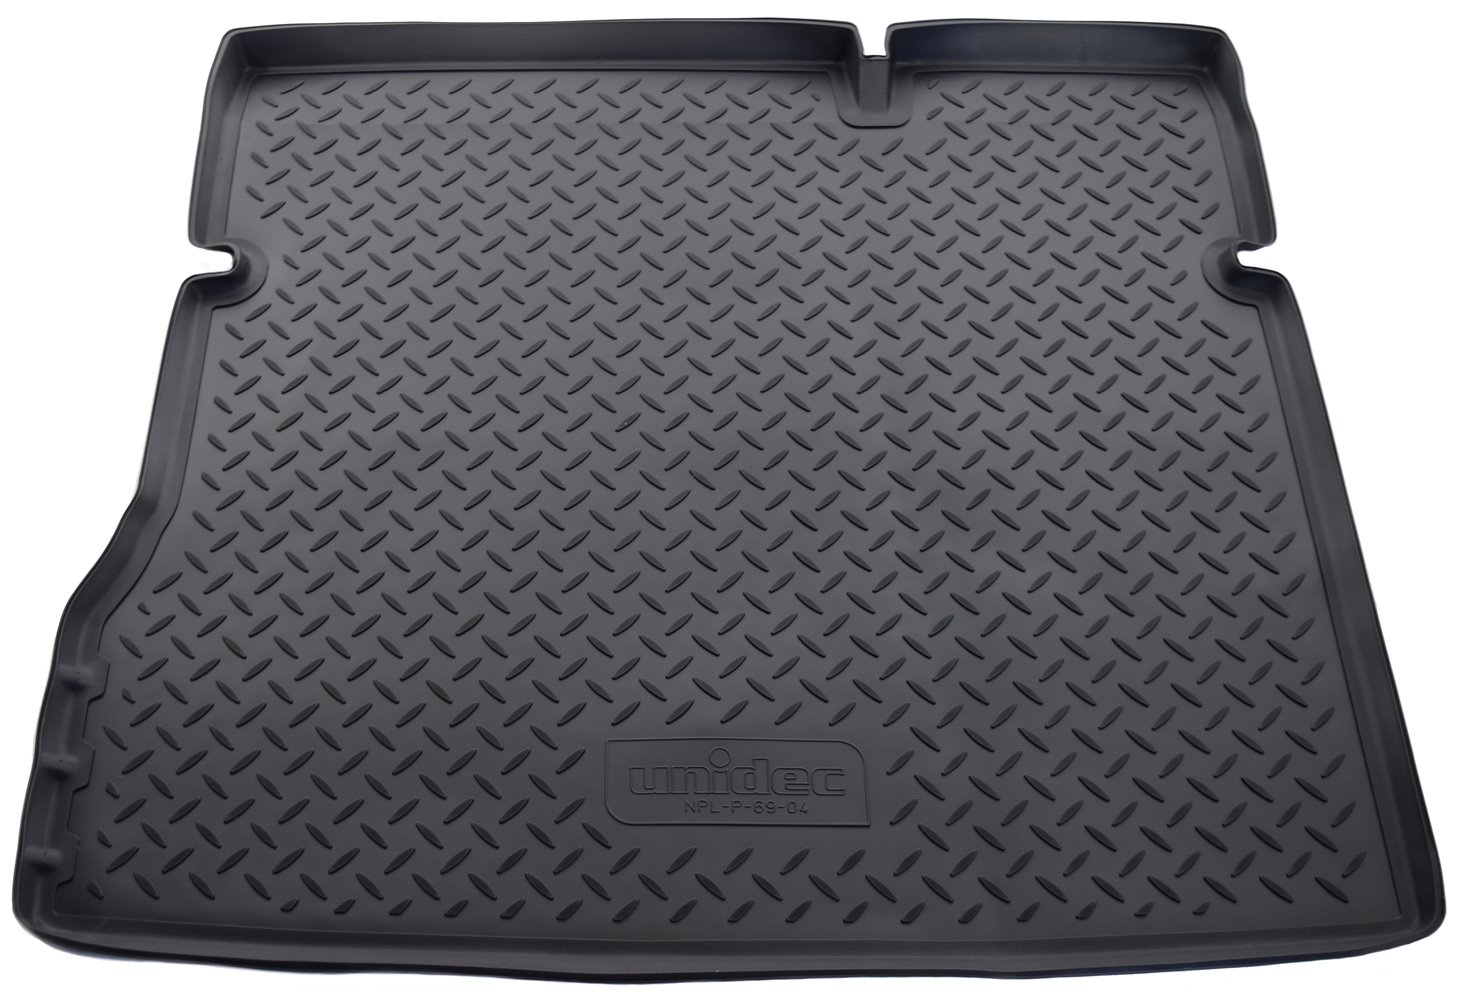 Коврик багажника для Nissan Terrano, 2WD, 2014, Renault Duster, 2WD, 2011, NPL-P-69-04, черный коврик багажника полиуретан чёрный 2awd norplast npl p 69 04 для renault duster 2011